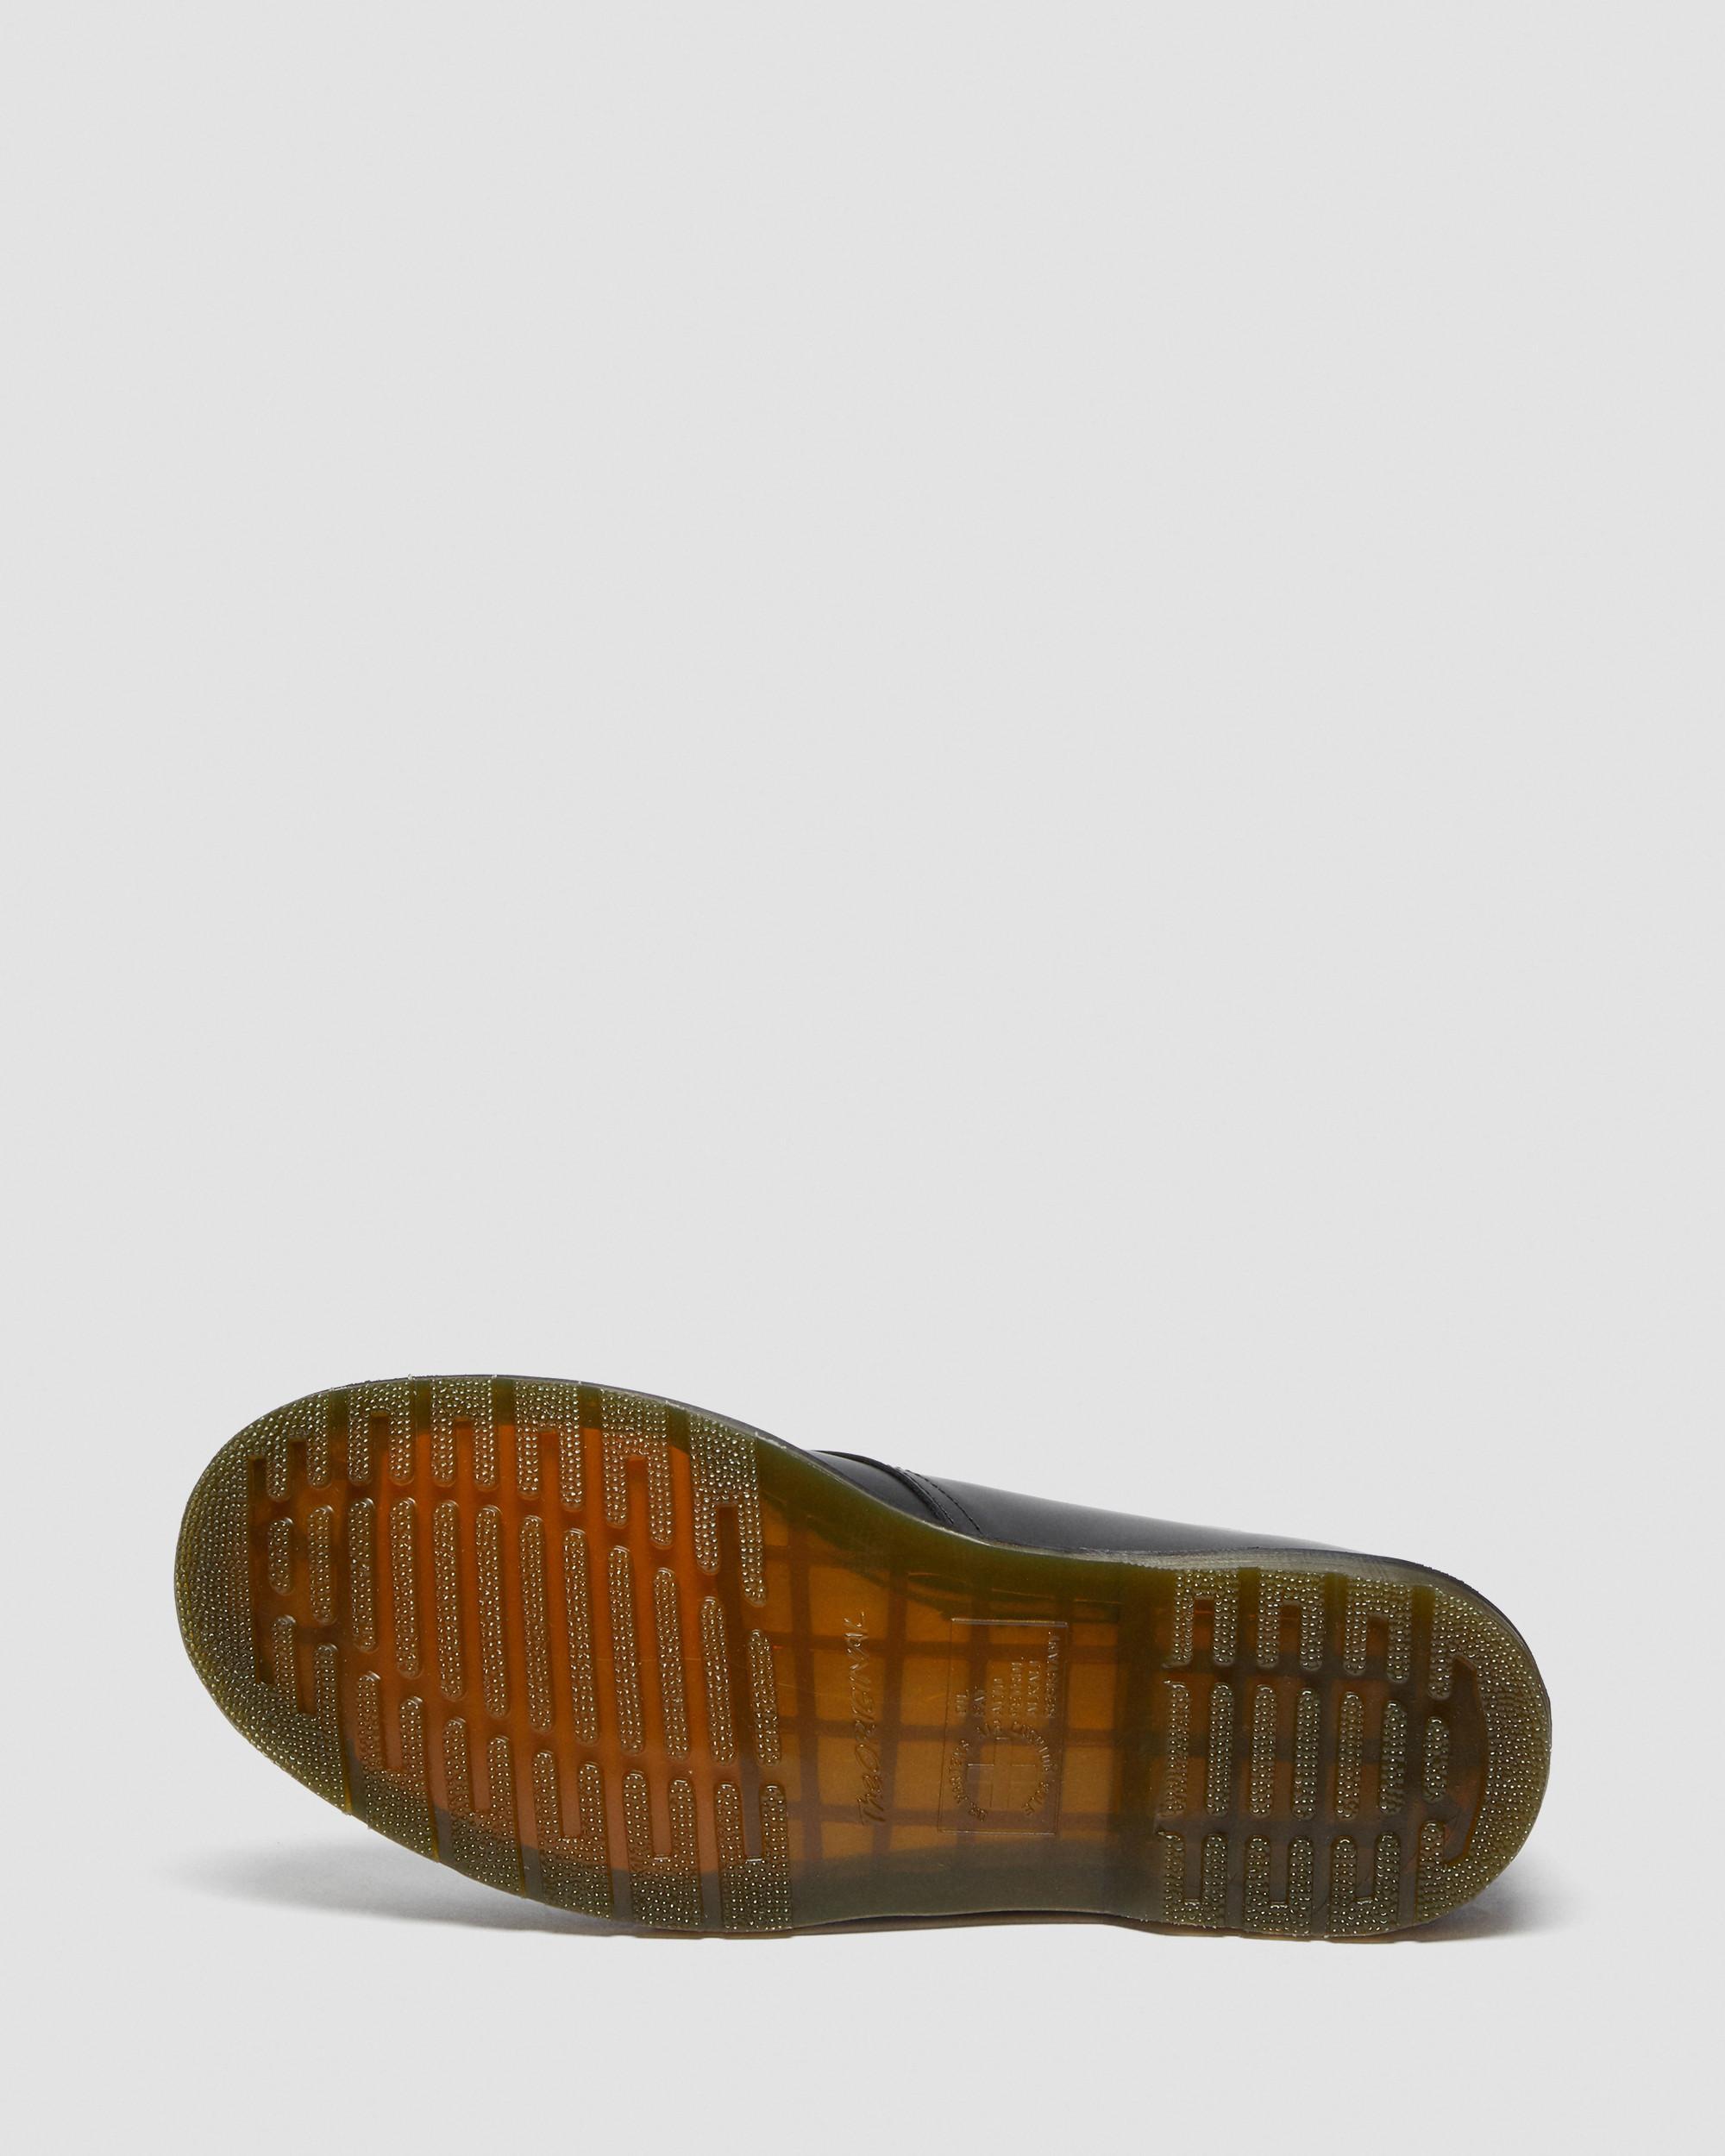 Unisex Dr Martens 1461 PW Black Greasy 3 Eye Shoe